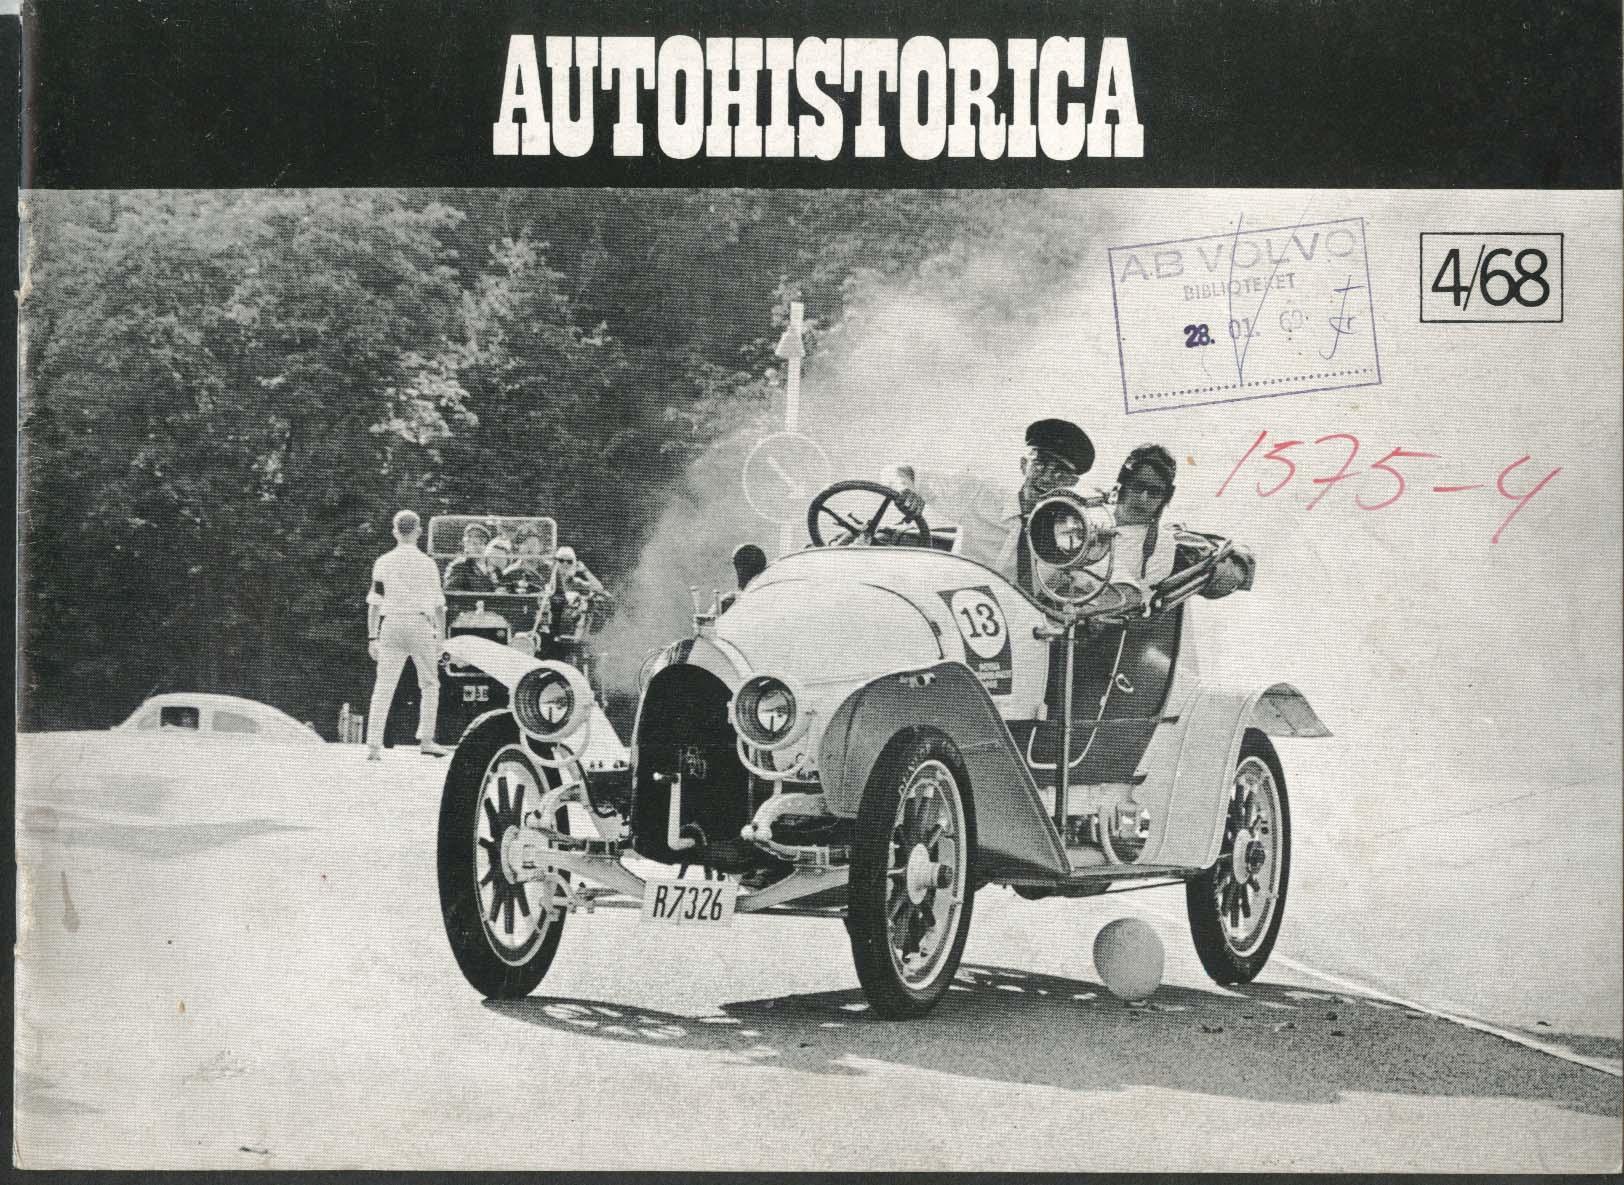 AUTOHISTORICA Skoklosterlopet Olympia Show Svenska Veteranbil-rallyt 4 1968